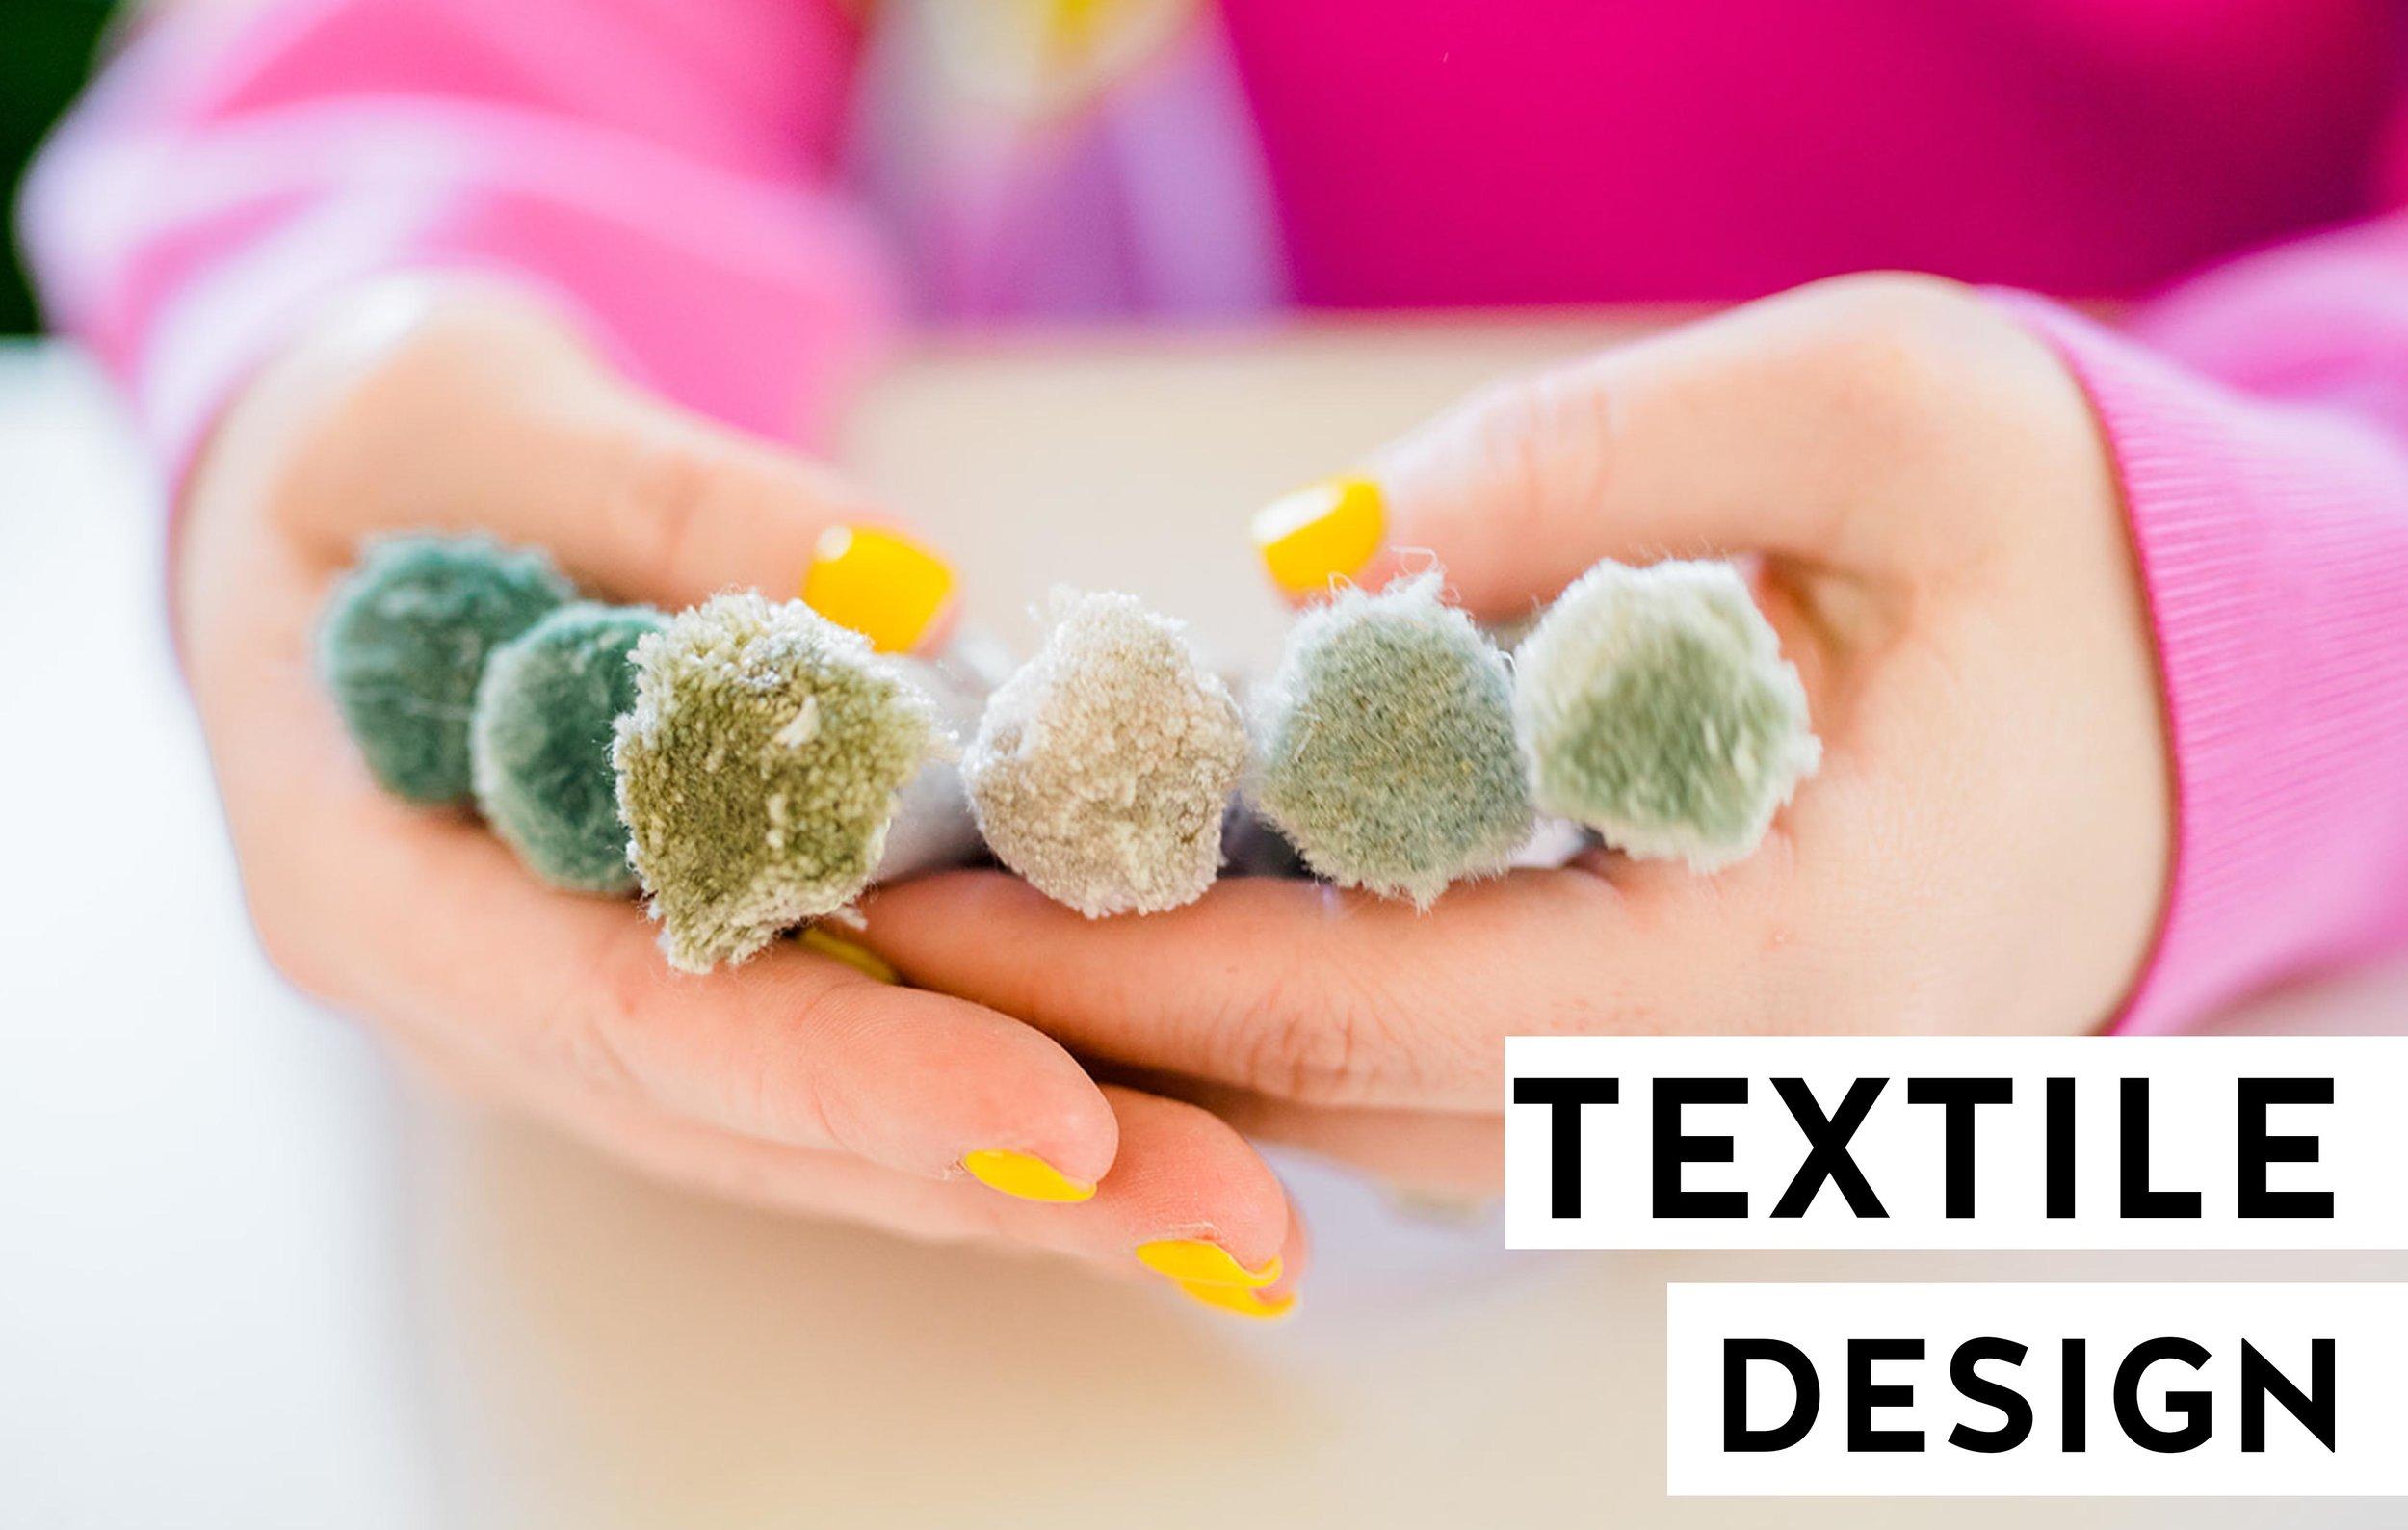 Textile-Design_4.jpg